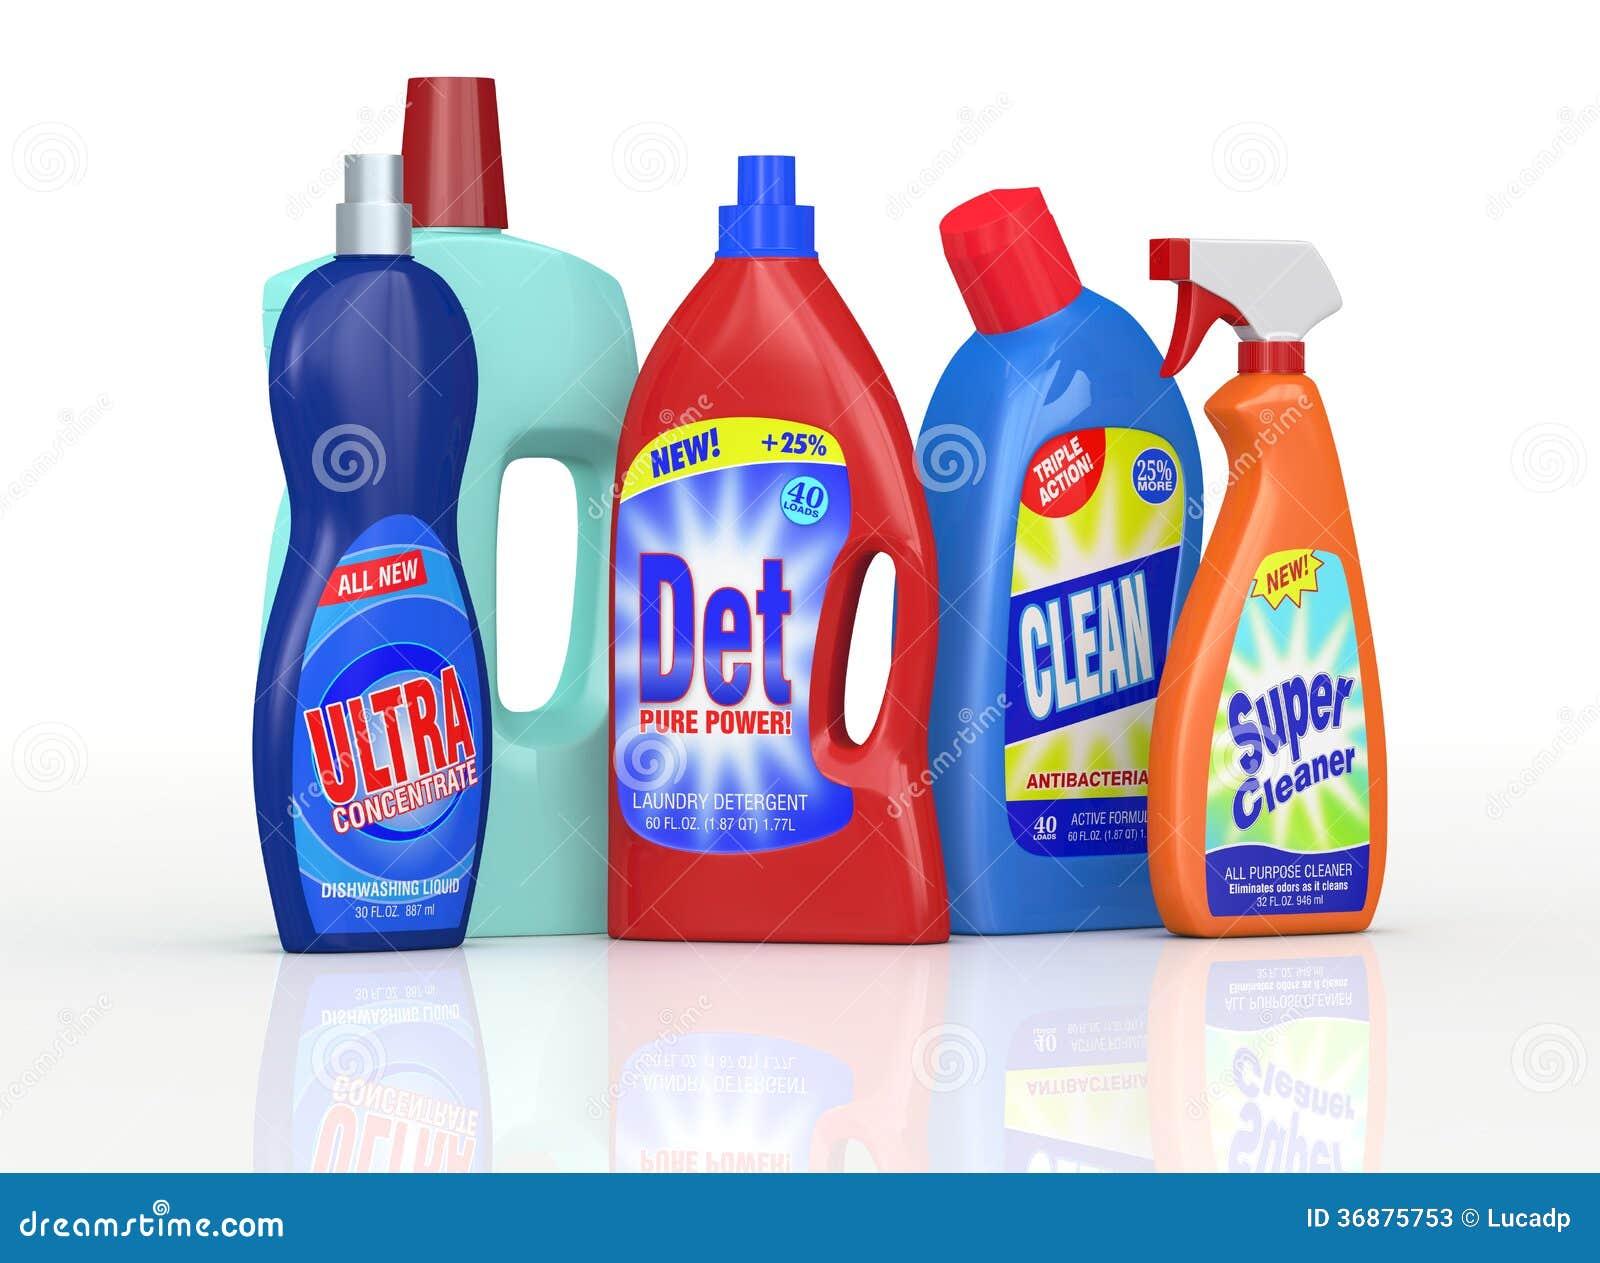 Detergent Bottles Stock Photos Image 36875753